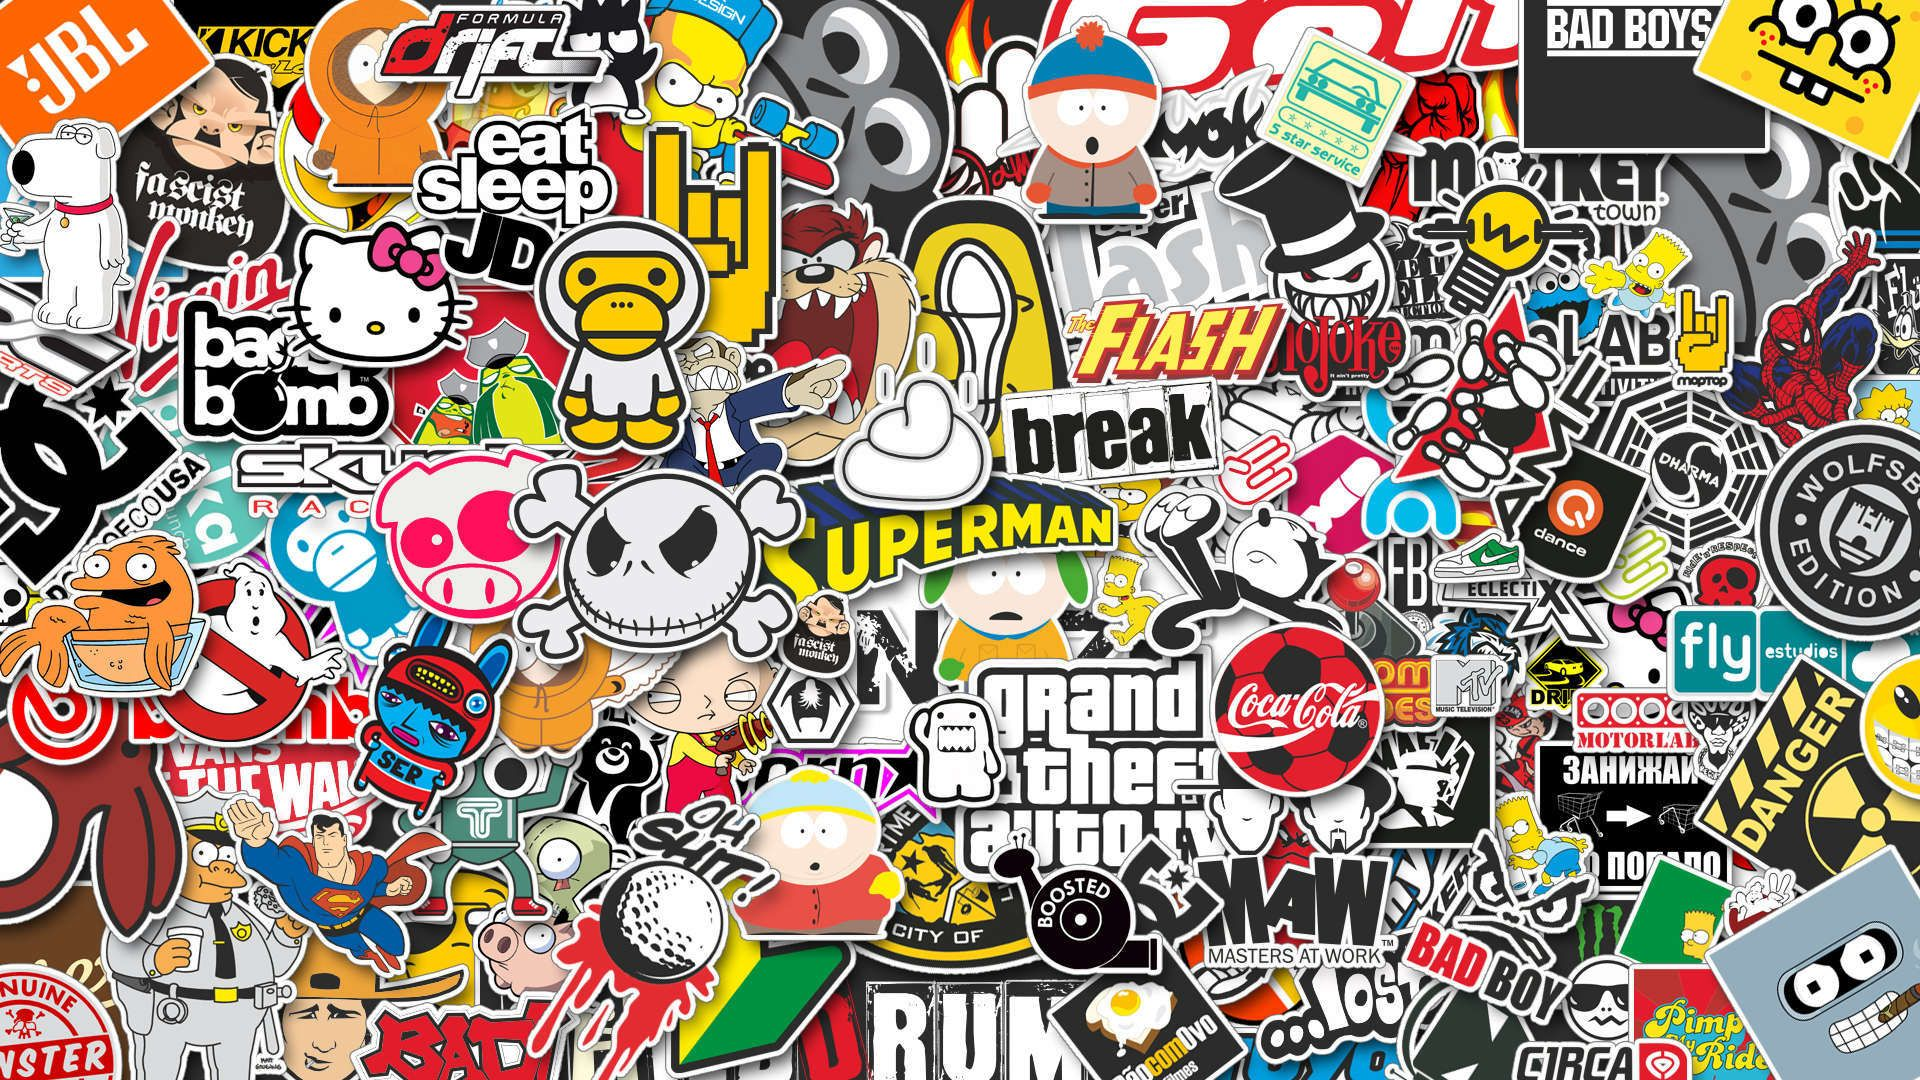 Stickers Style Jdm Hd Wallpaper 1080p | logo's | Wallpaper, Sticker bomb, Stickers